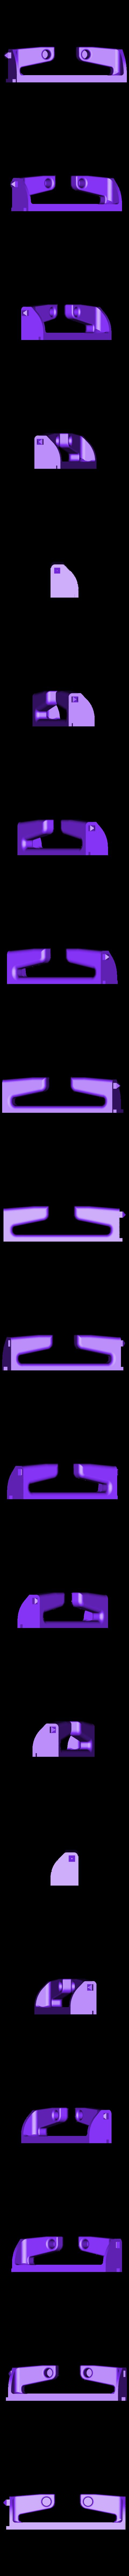 suport verre avS.stl Download free STL file Glass door • Template to 3D print, JMC3D